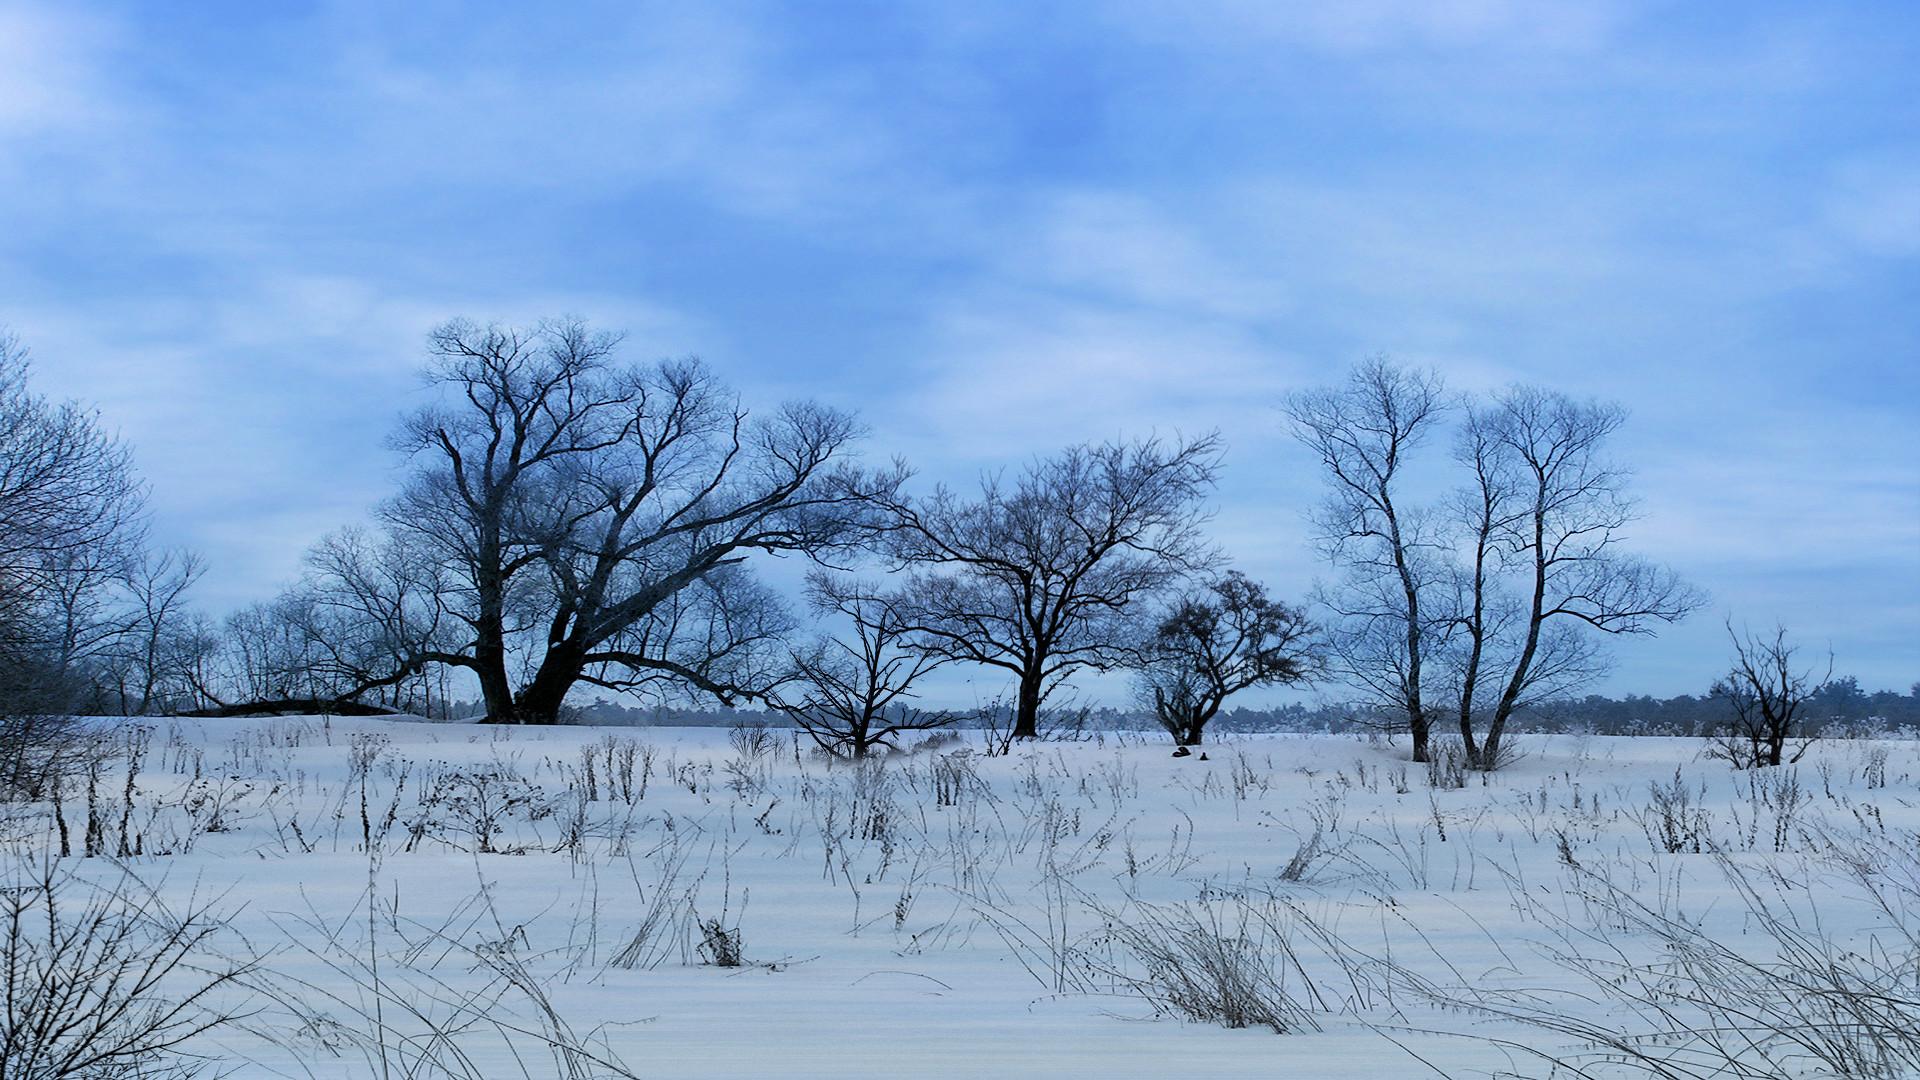 Logonstudio Screensavers Explore Trees Winter wallpapers HD free .